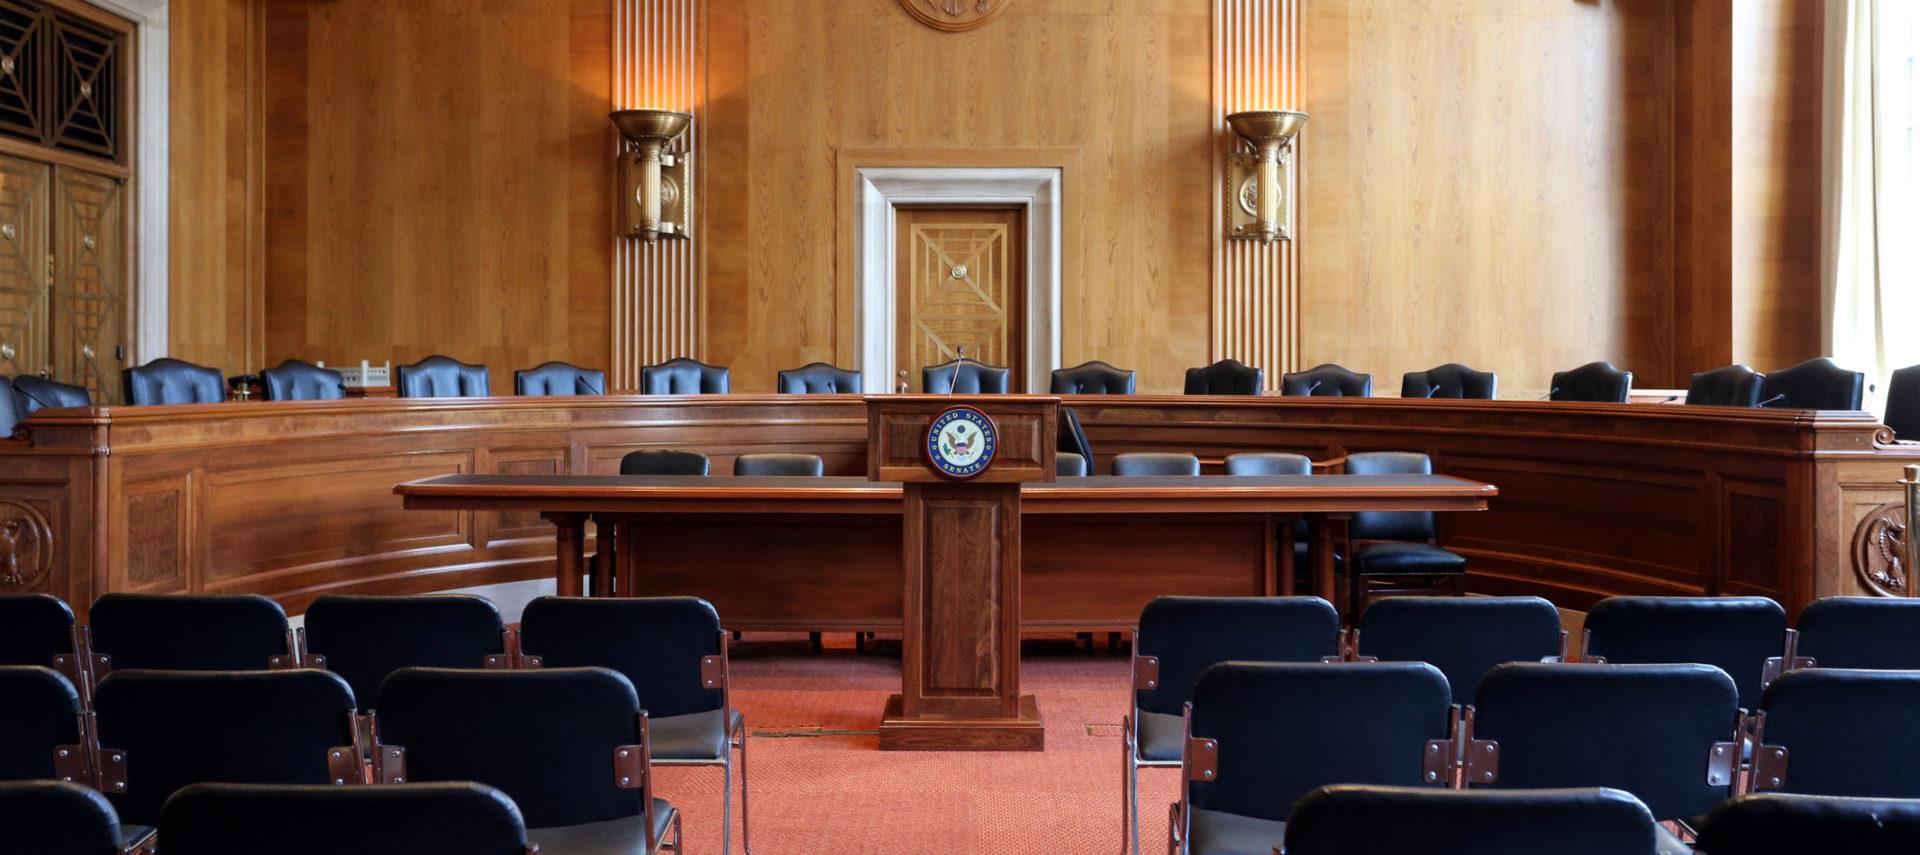 US Senate Hearing Room chairs and podium